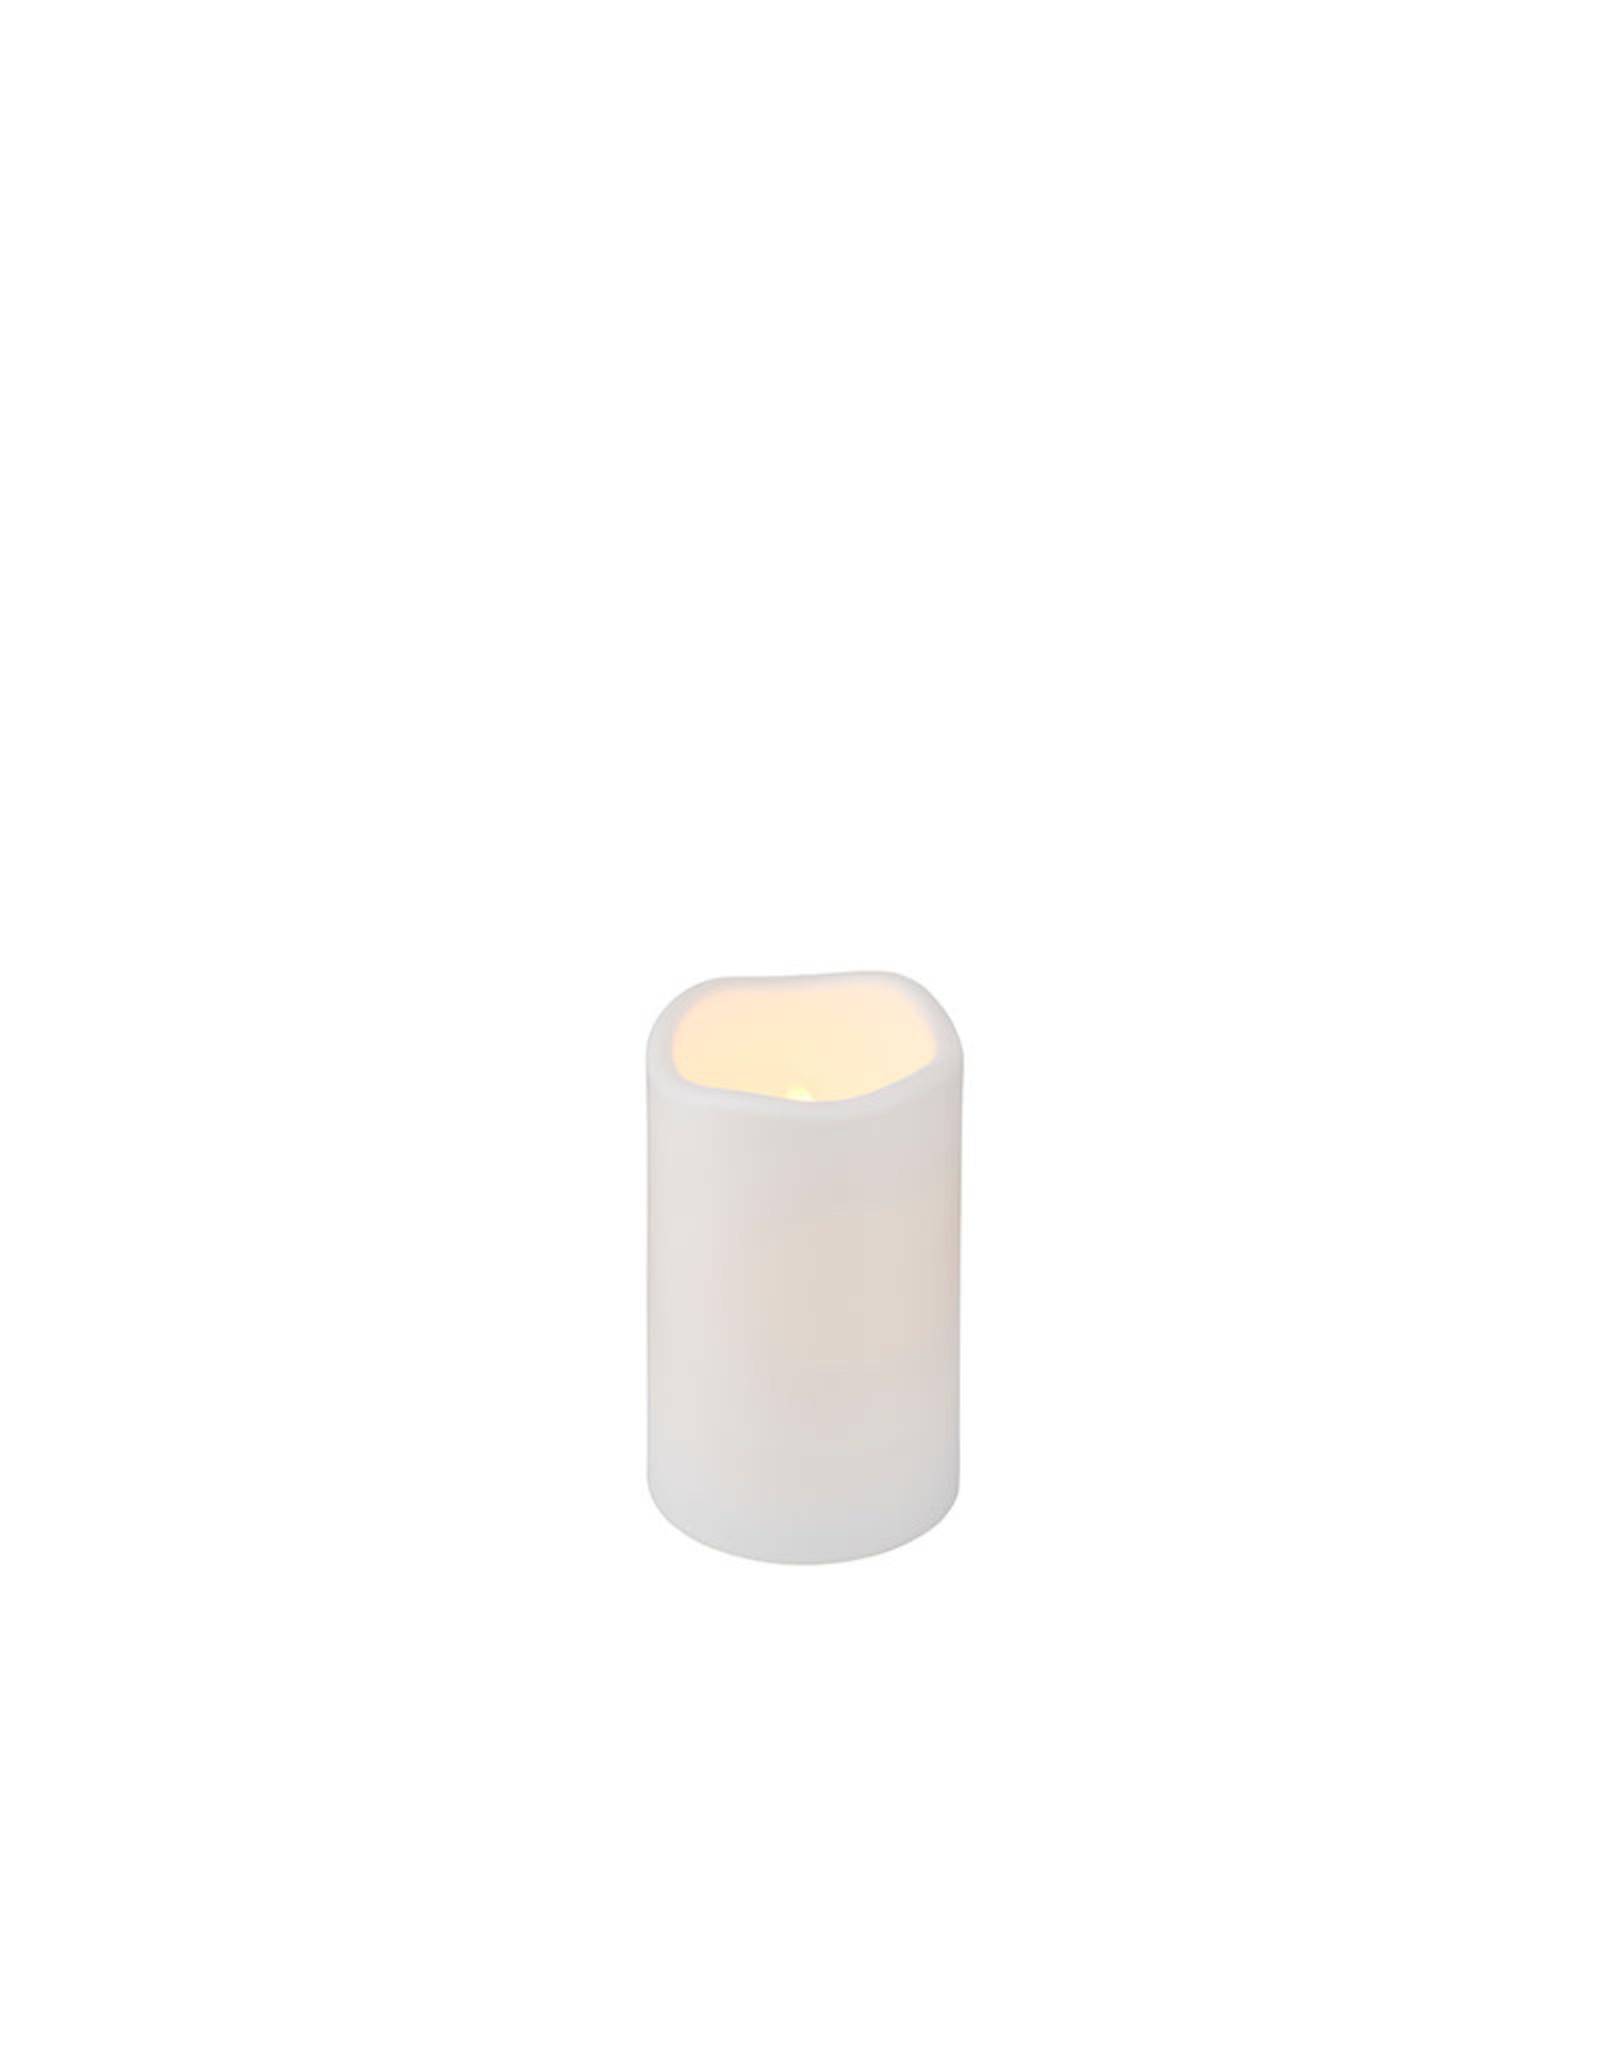 SIRIUS SIRIUS STORM LED CANDLE H12.5